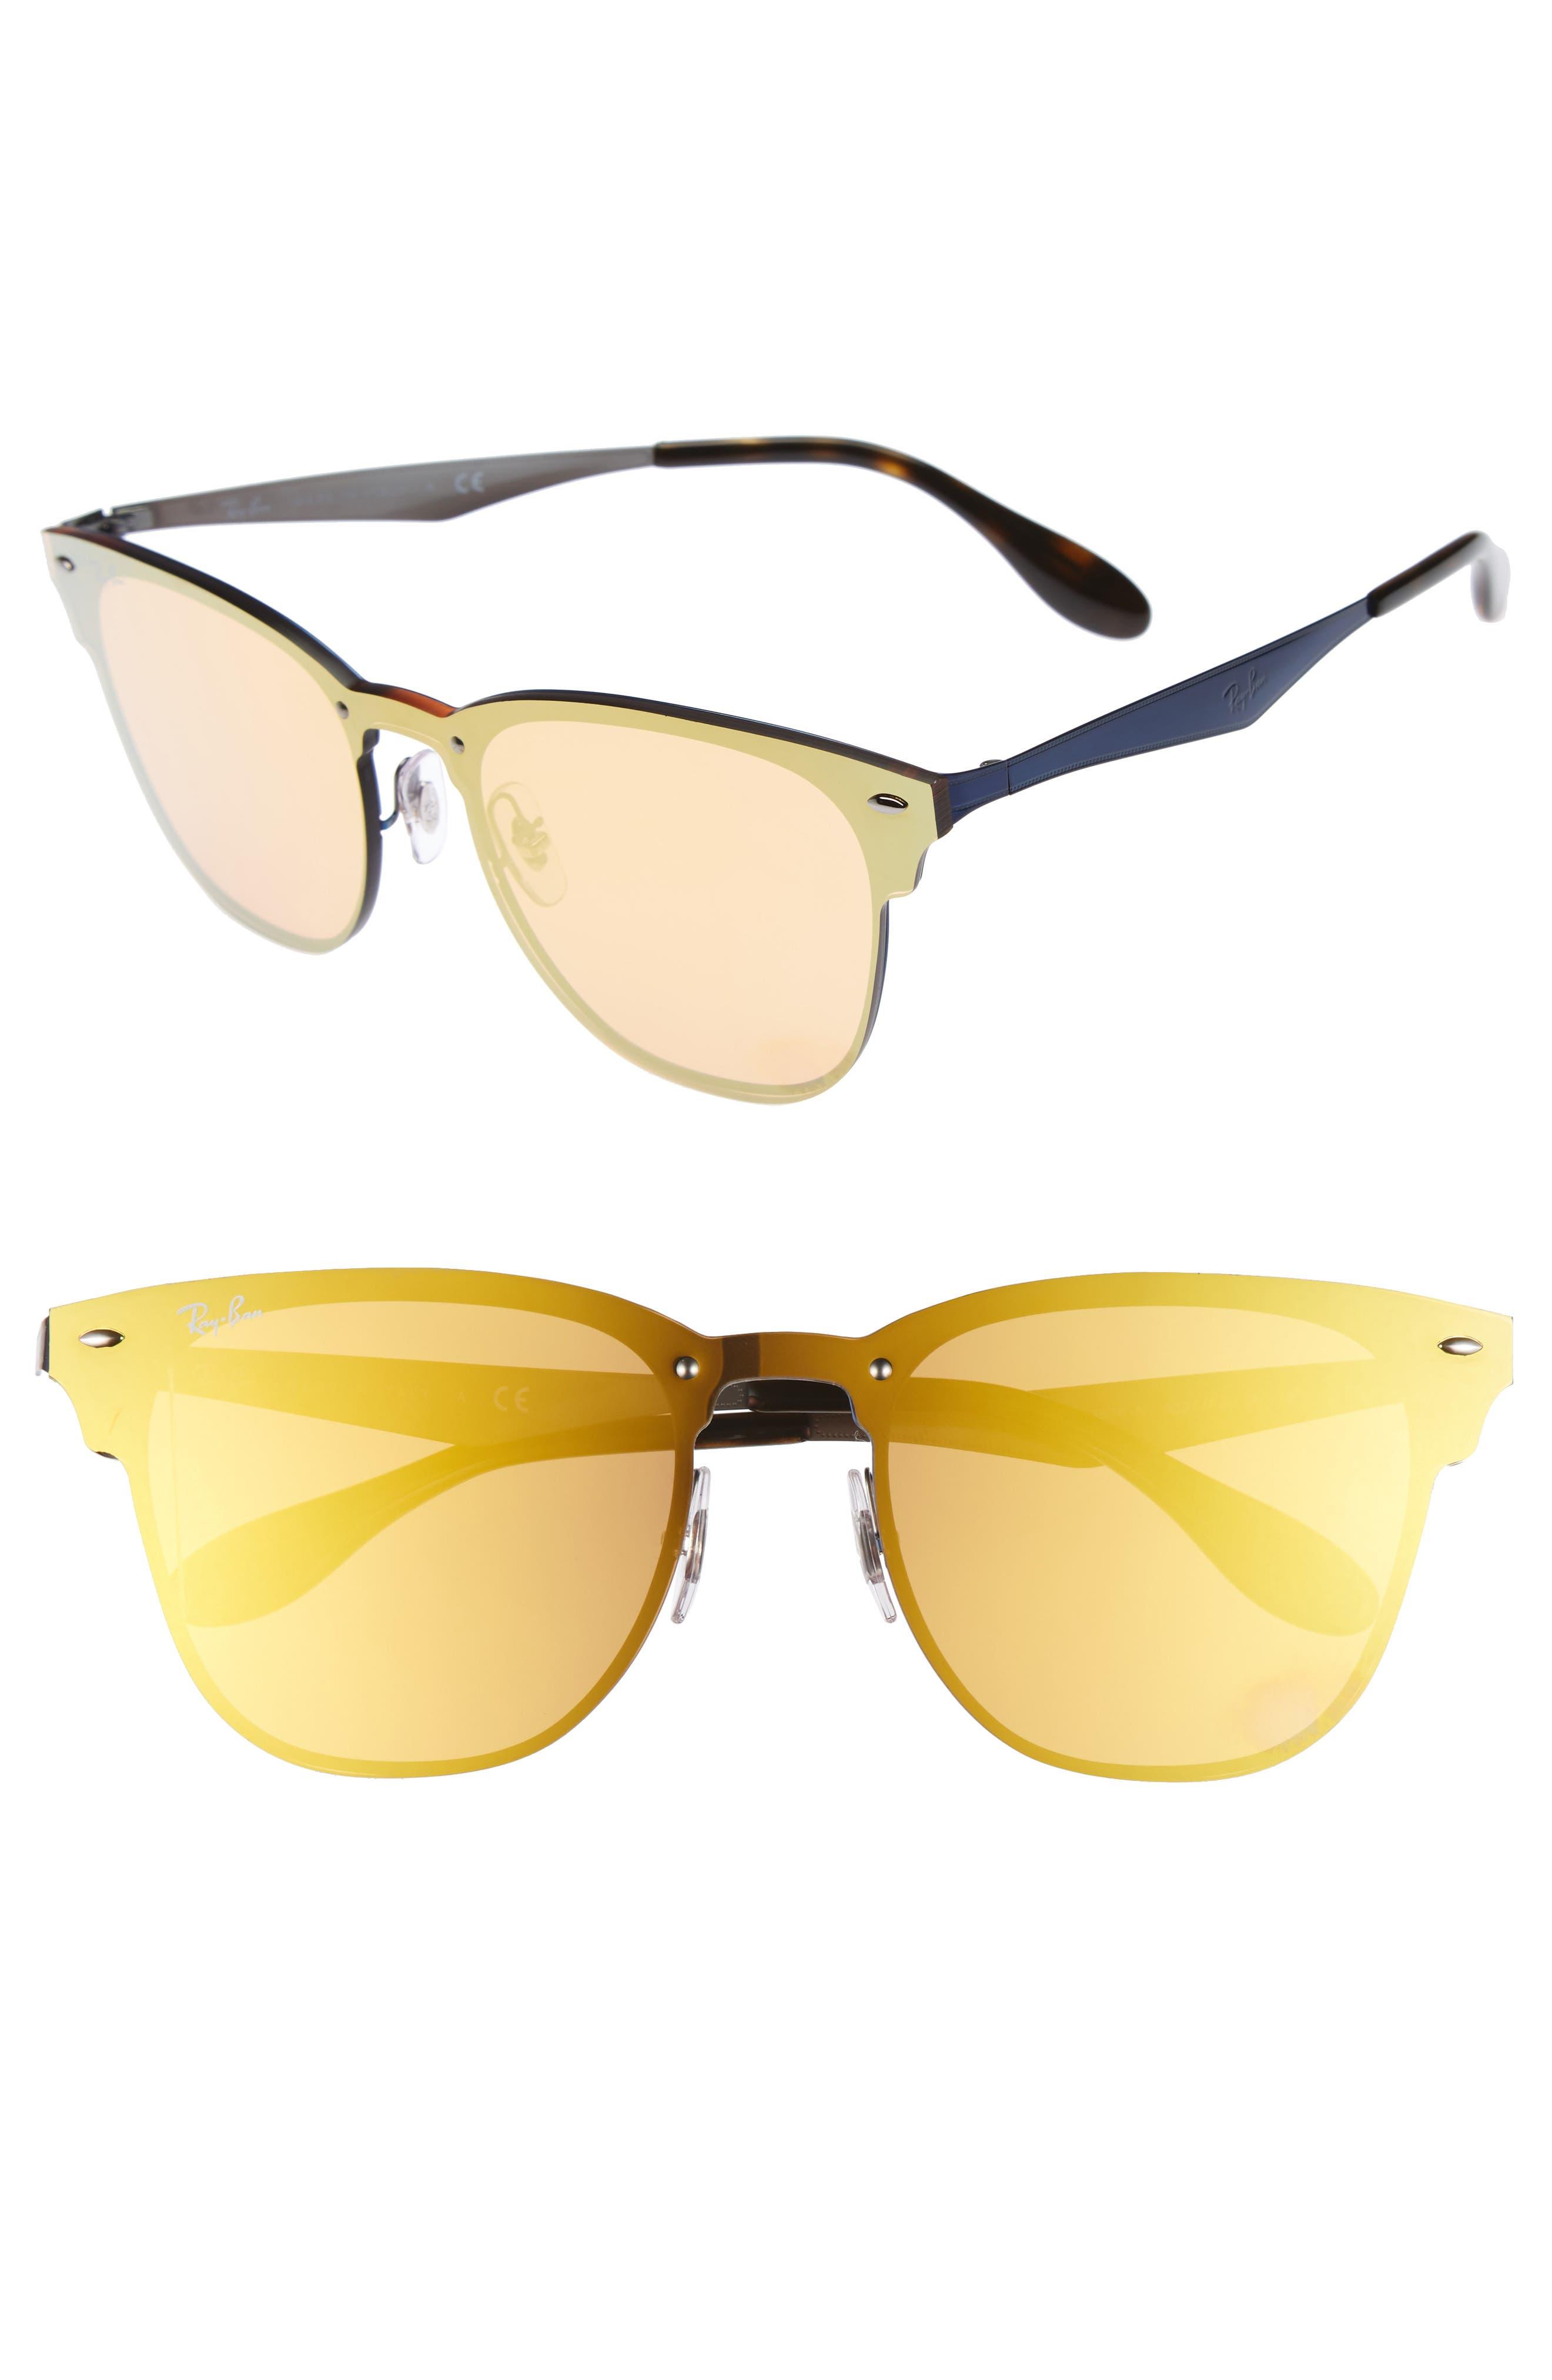 Main Image - Ray-Ban 52mm Mirrored Sunglasses